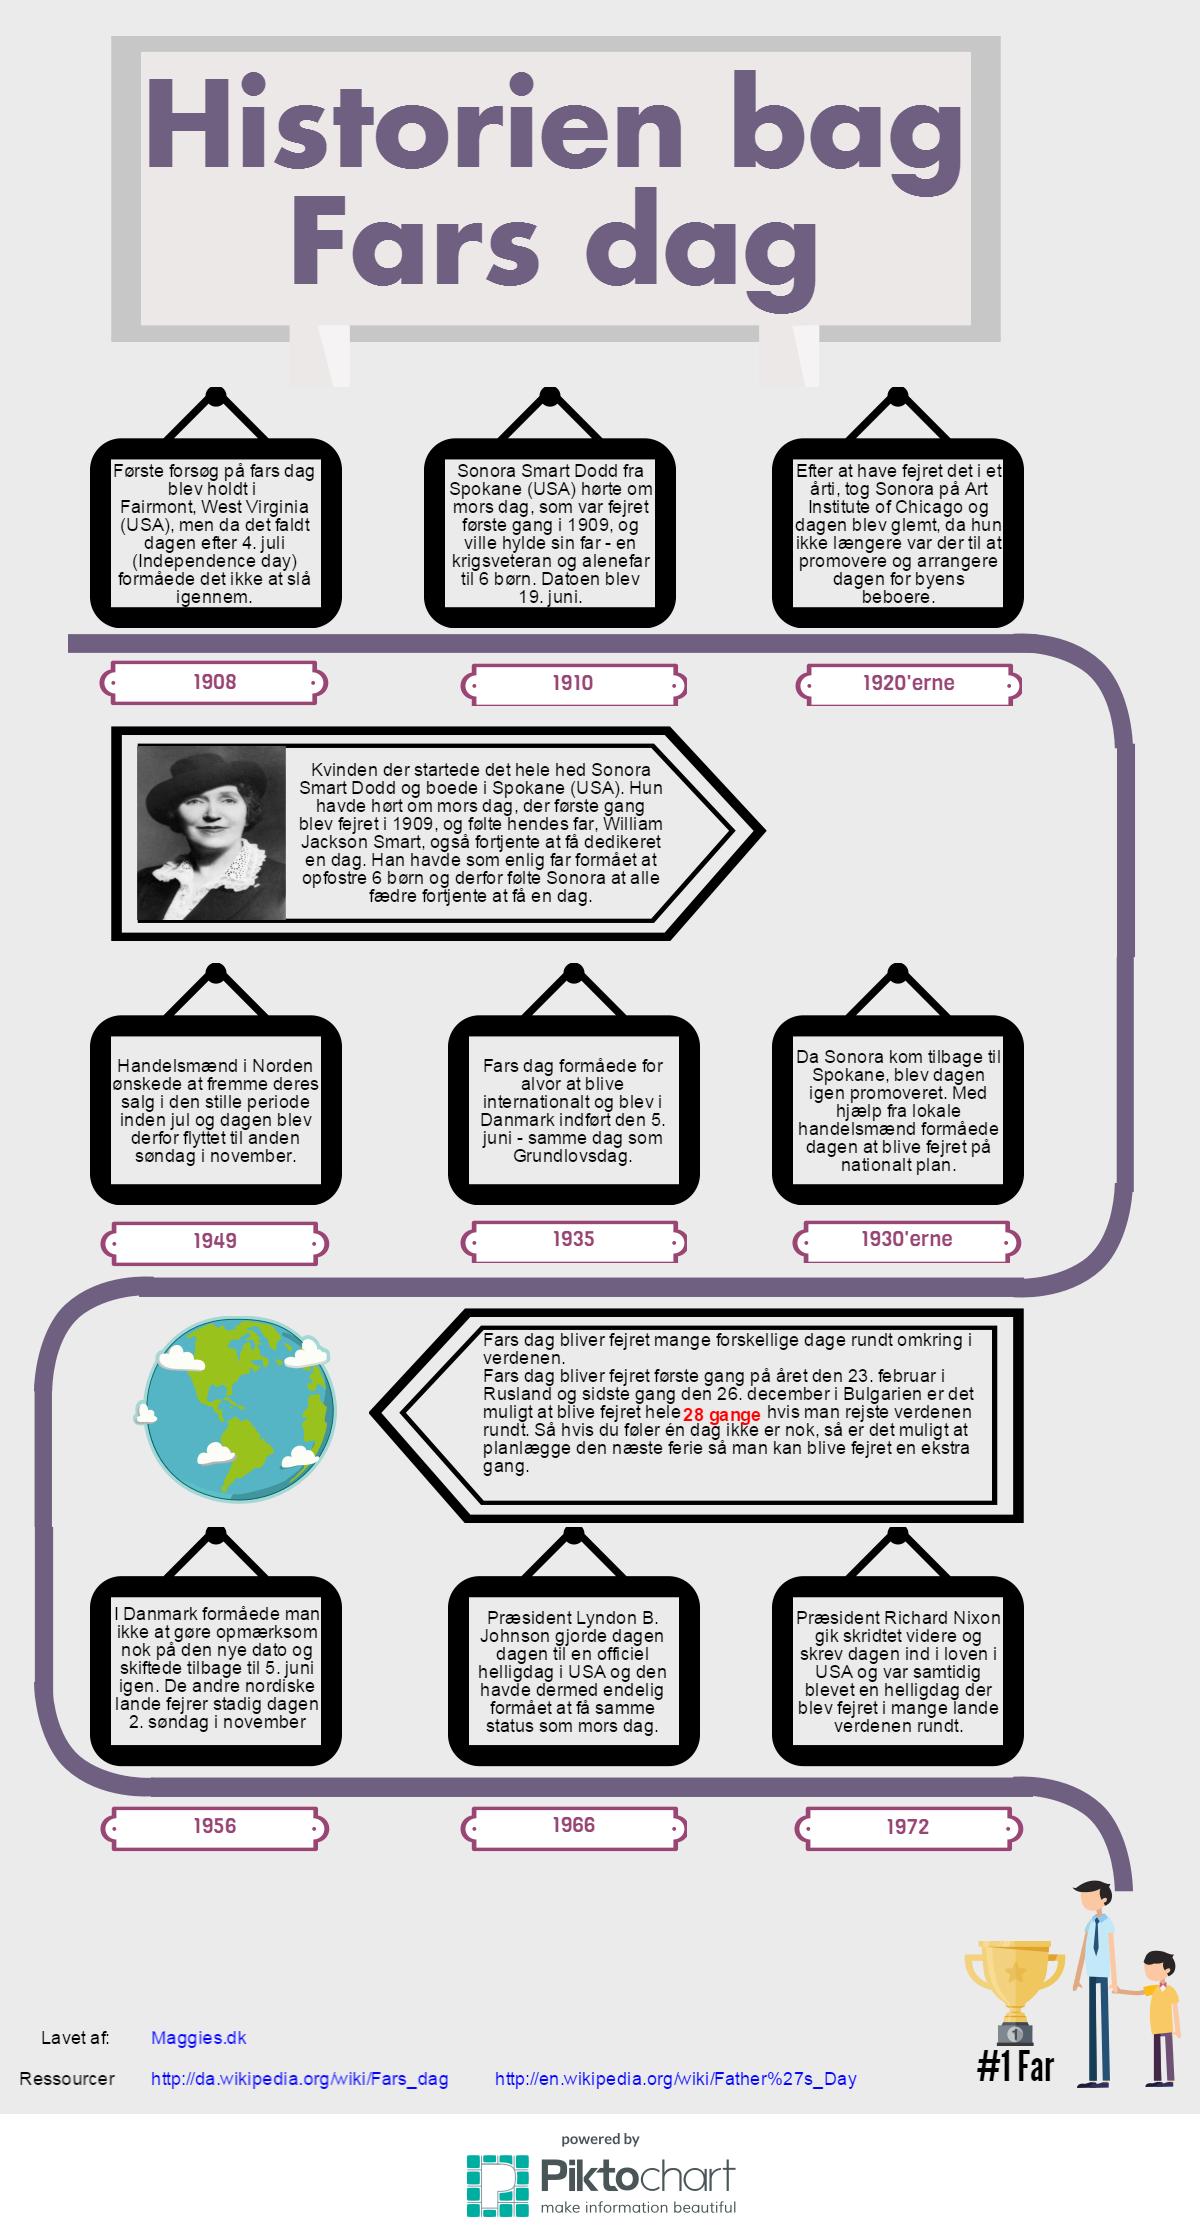 Historien bag Fars dag infographic